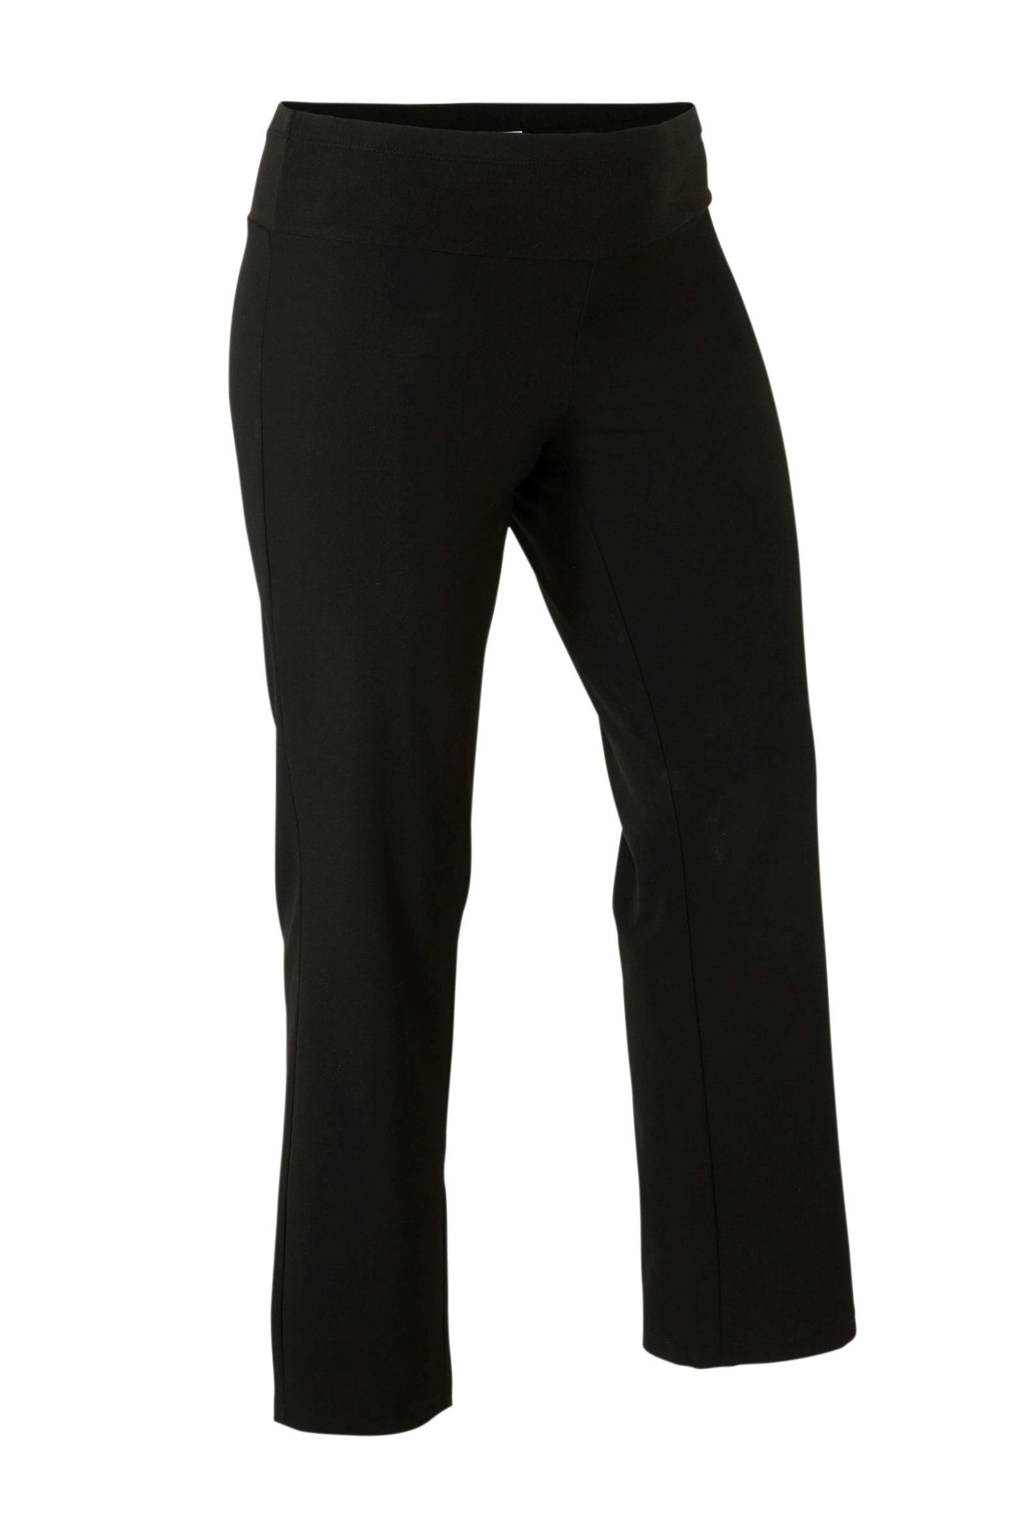 Yesta skinny broek zwart, Zwart